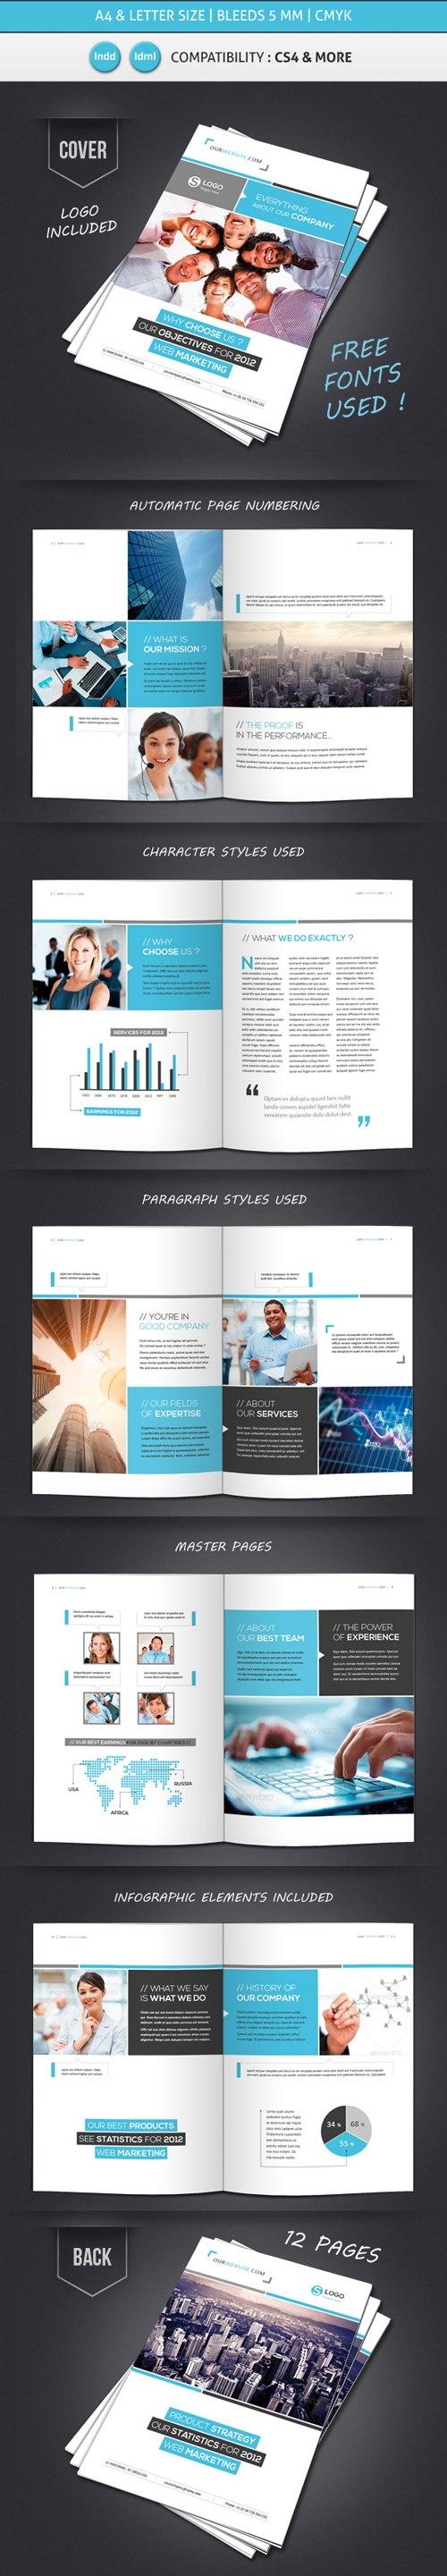 Professional Brochure Designs  Design  Graphic Design Junction Regarding 12 Page Brochure Template